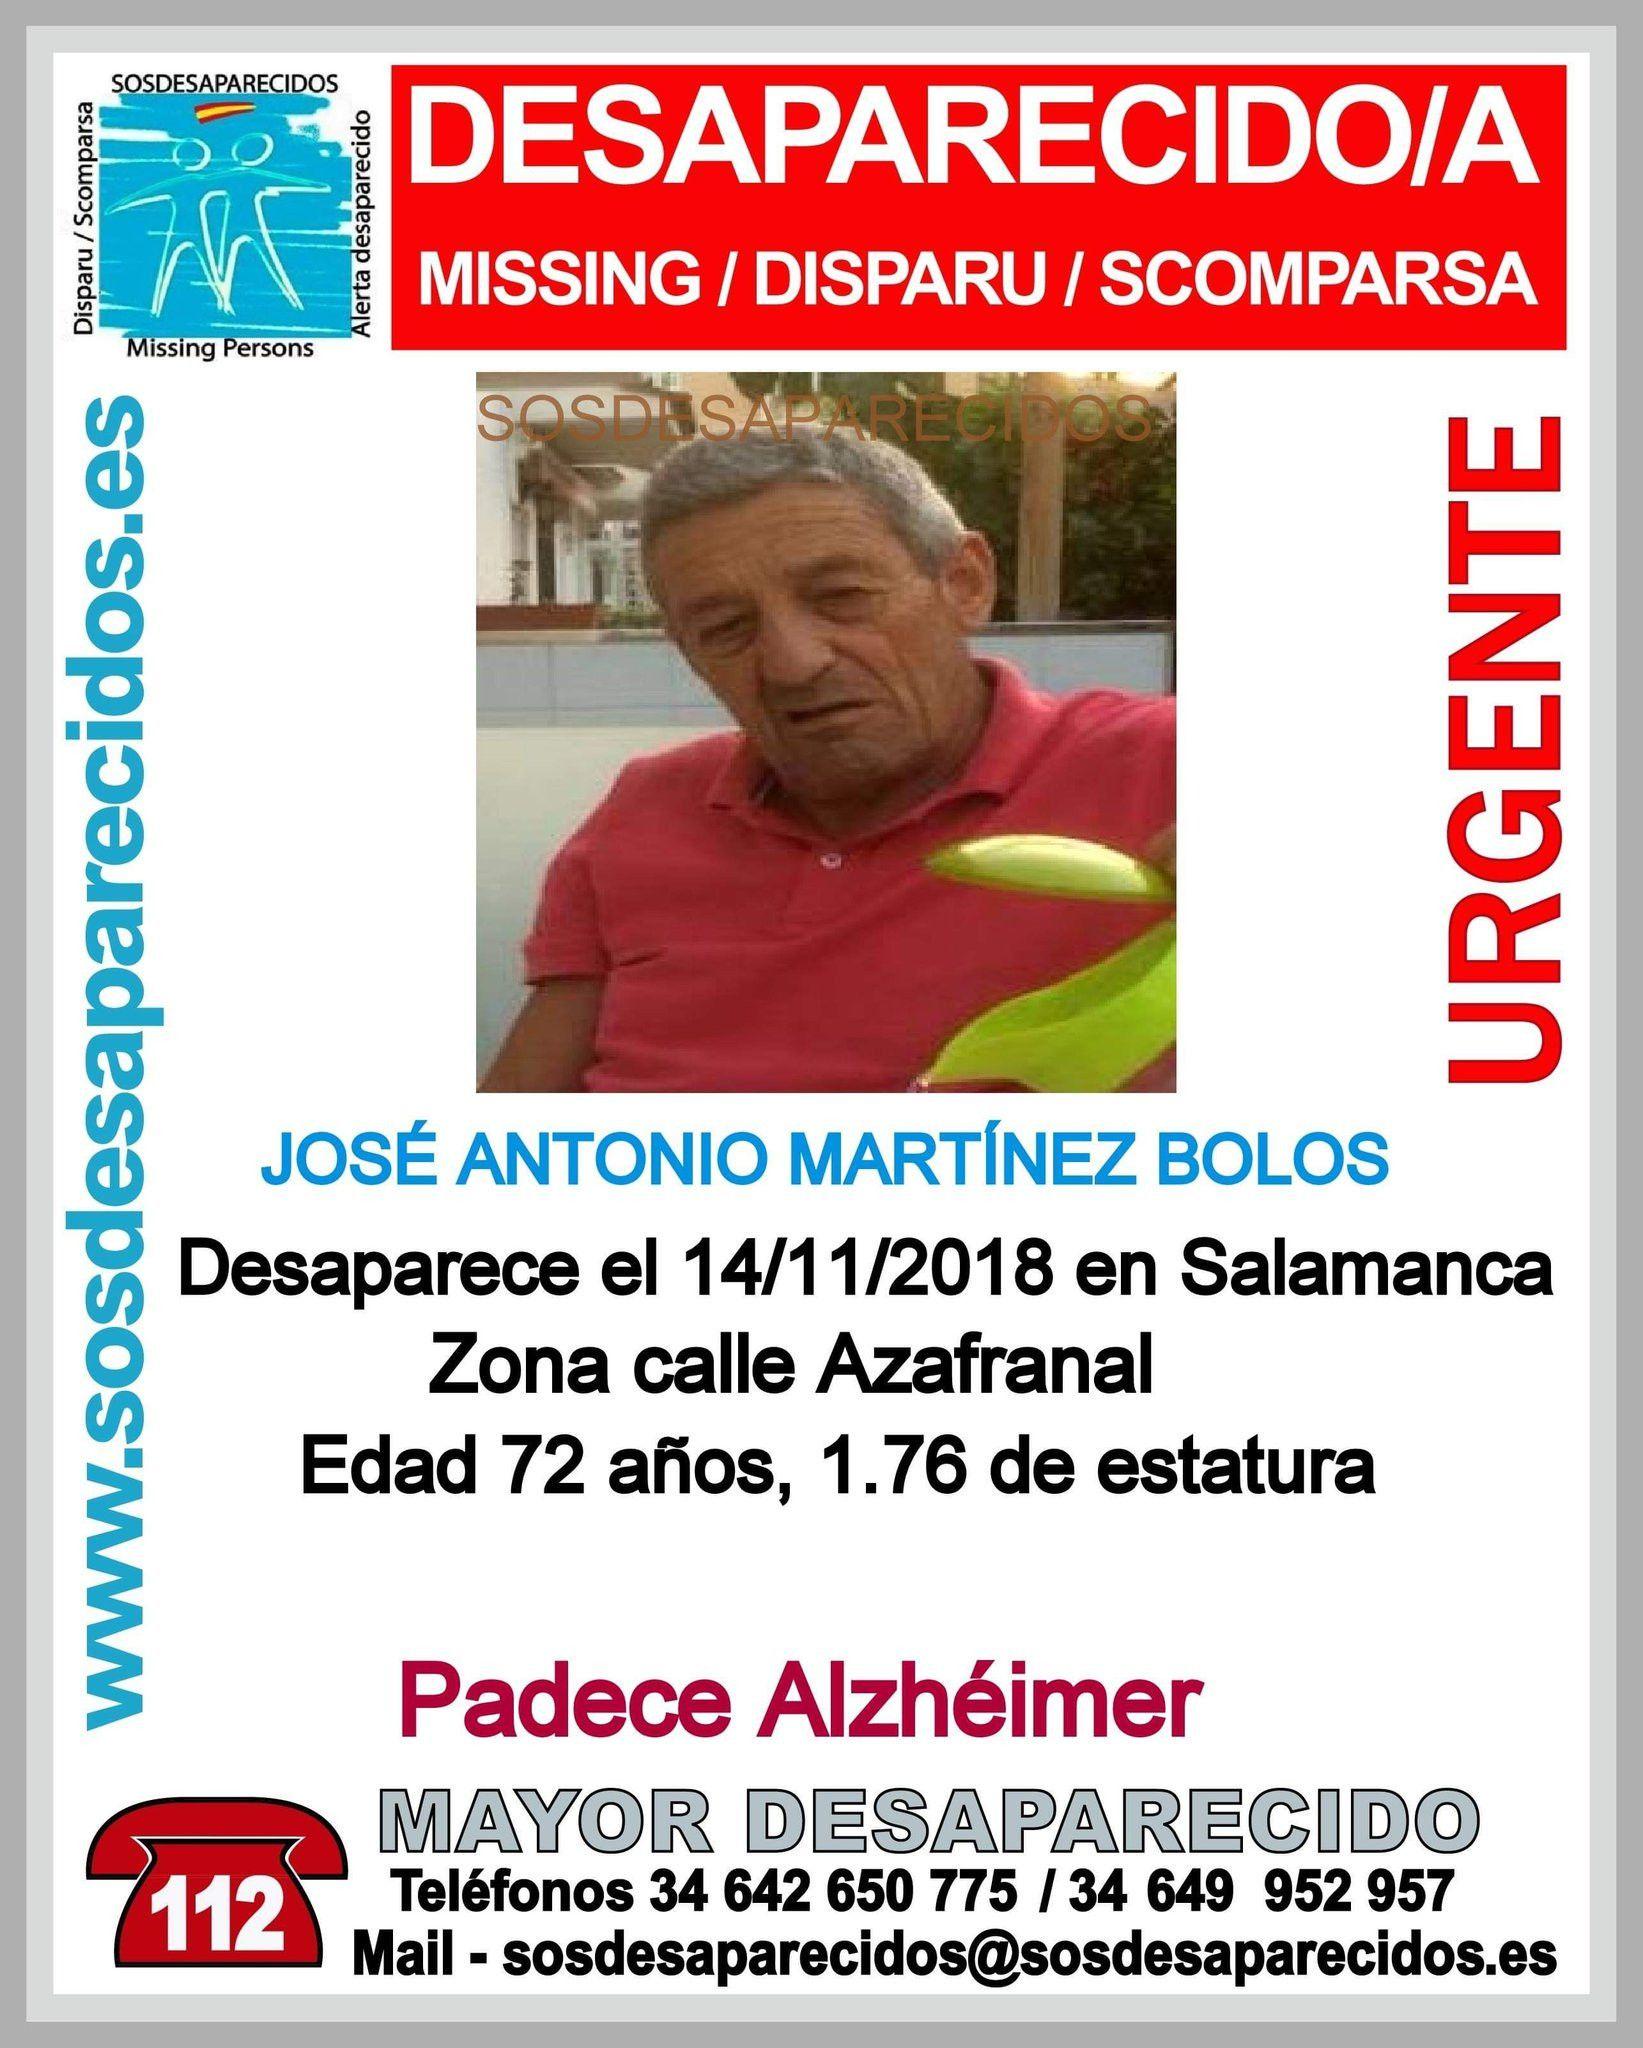 Desaparecido Azafranal